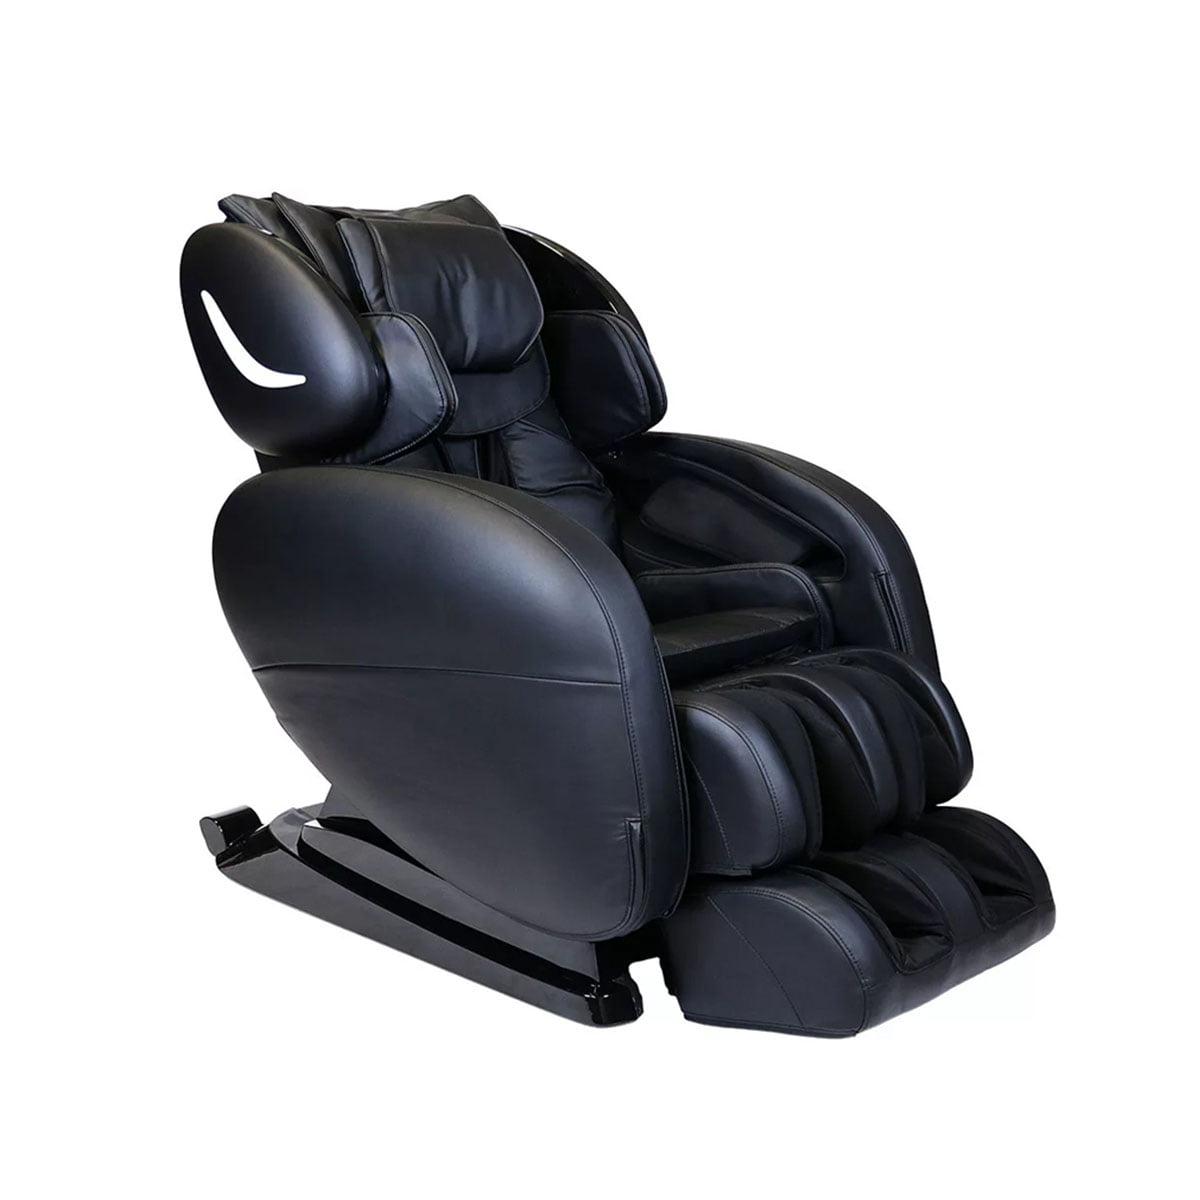 Japanese Chair Massage Near Me